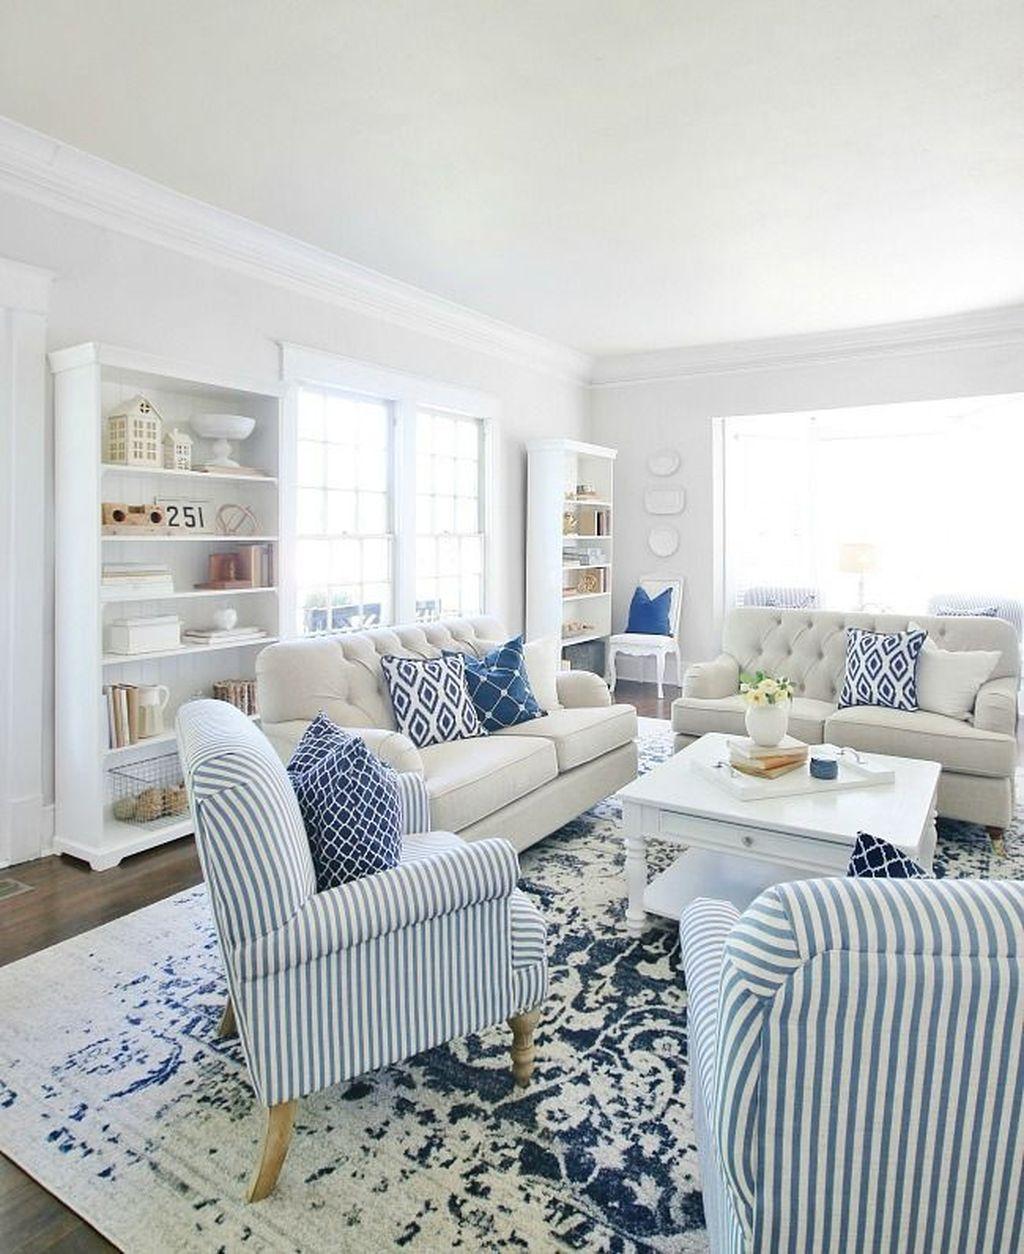 30 Outstanding Living Room Design For Summer Trenduhome Blue And White Living Room Farm House Living Room Blue Living Room